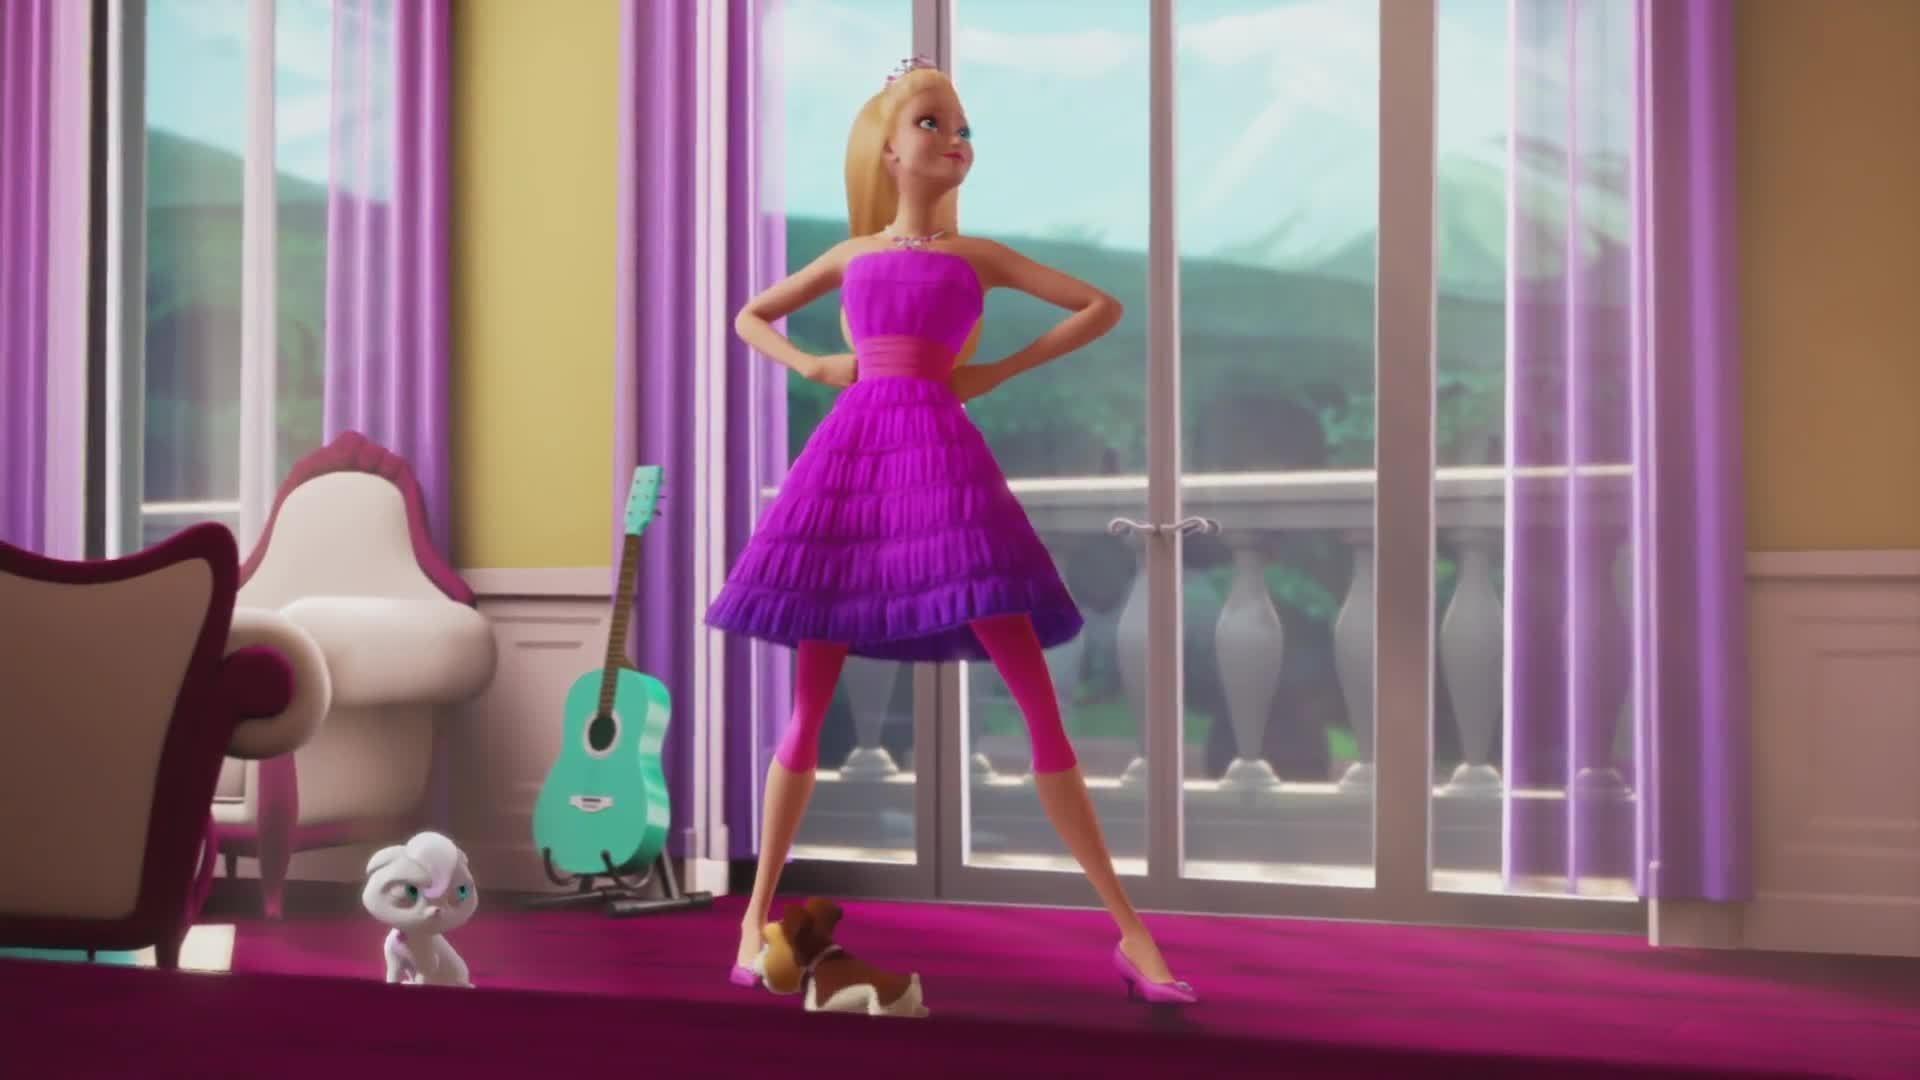 Res: 1920x1080, HD Widescreen Wallpaper - barbie in princess power